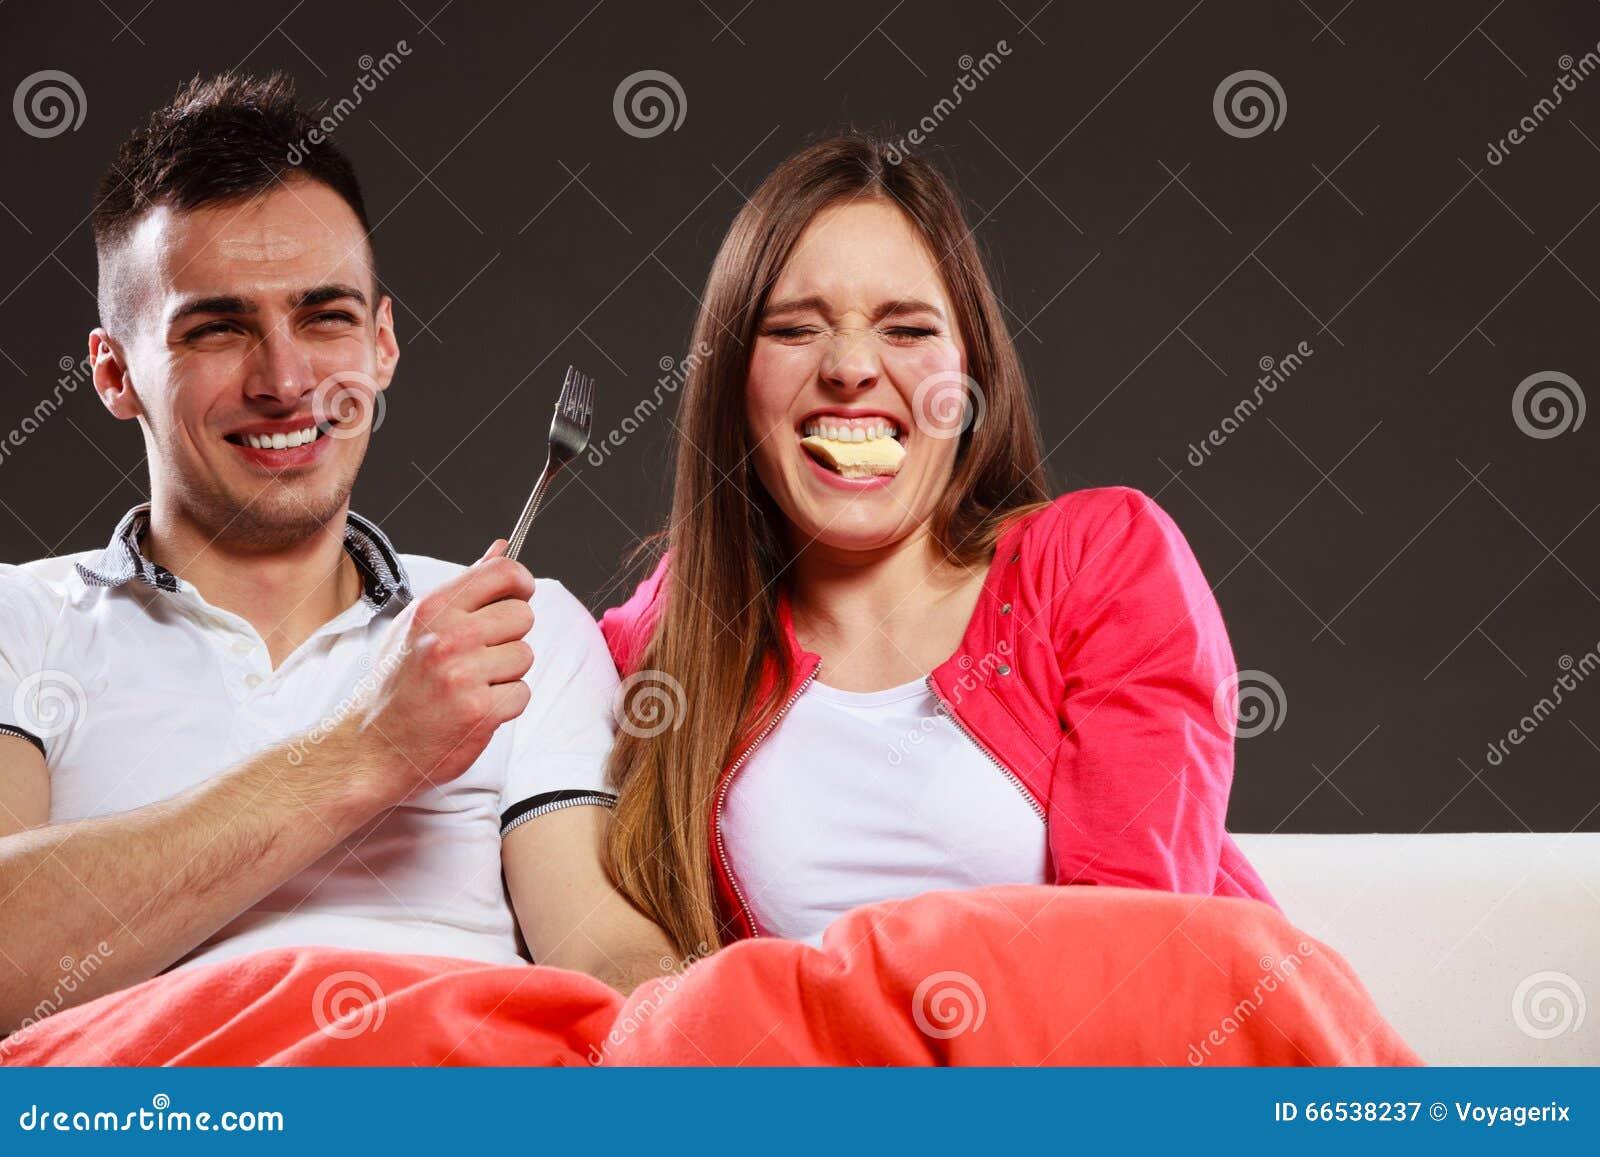 titlul bun intro pentru site- ul de dating bun dating banter